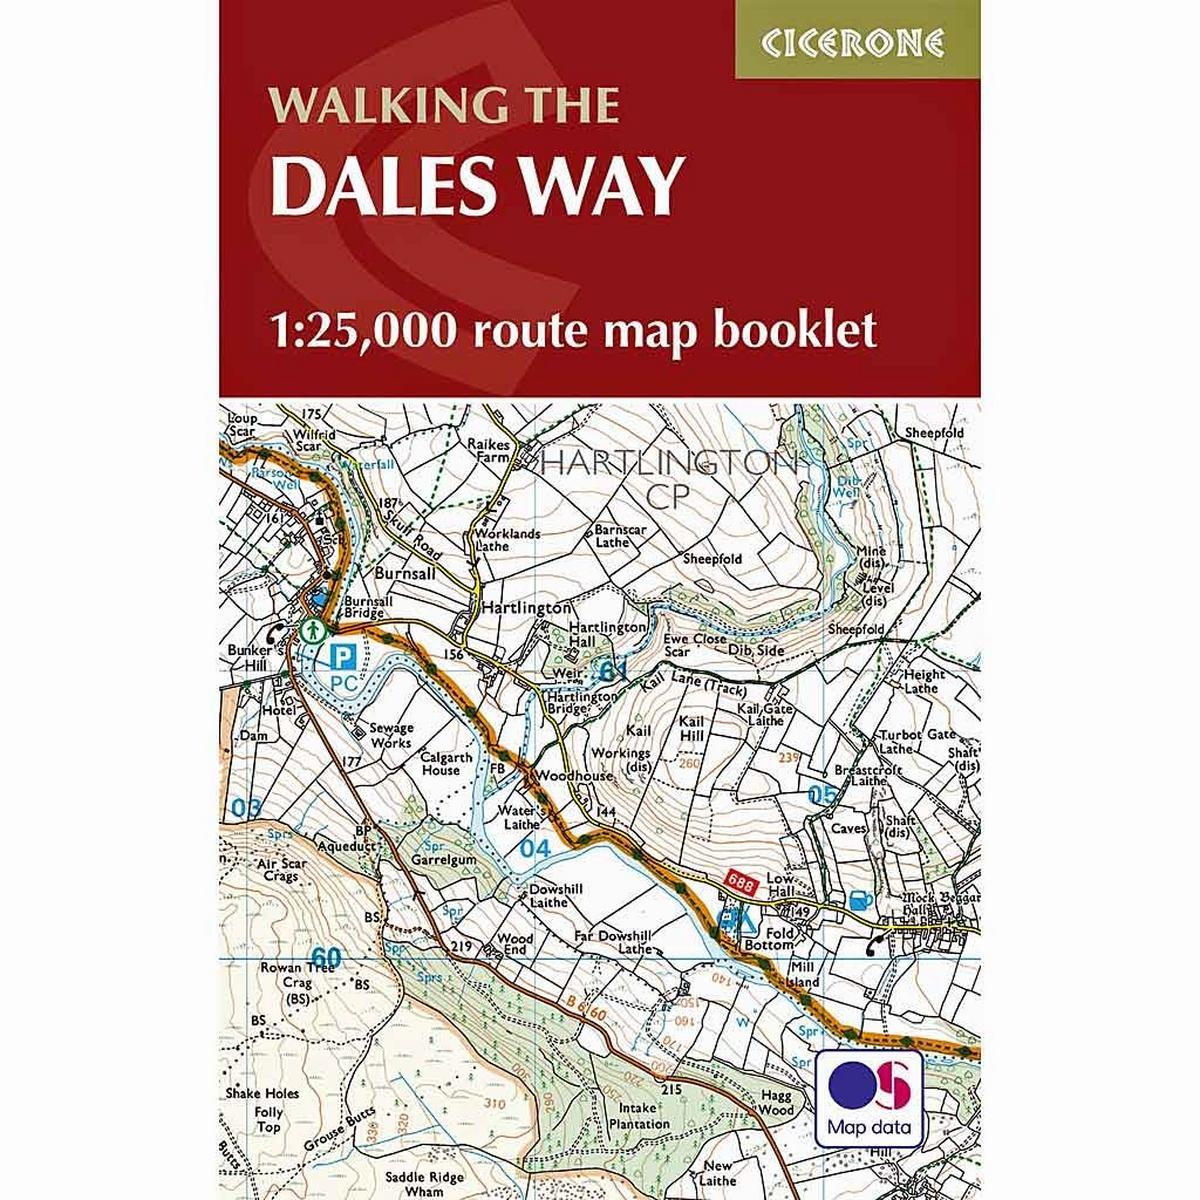 Cicerone Walking Guidebook - The Dales Way